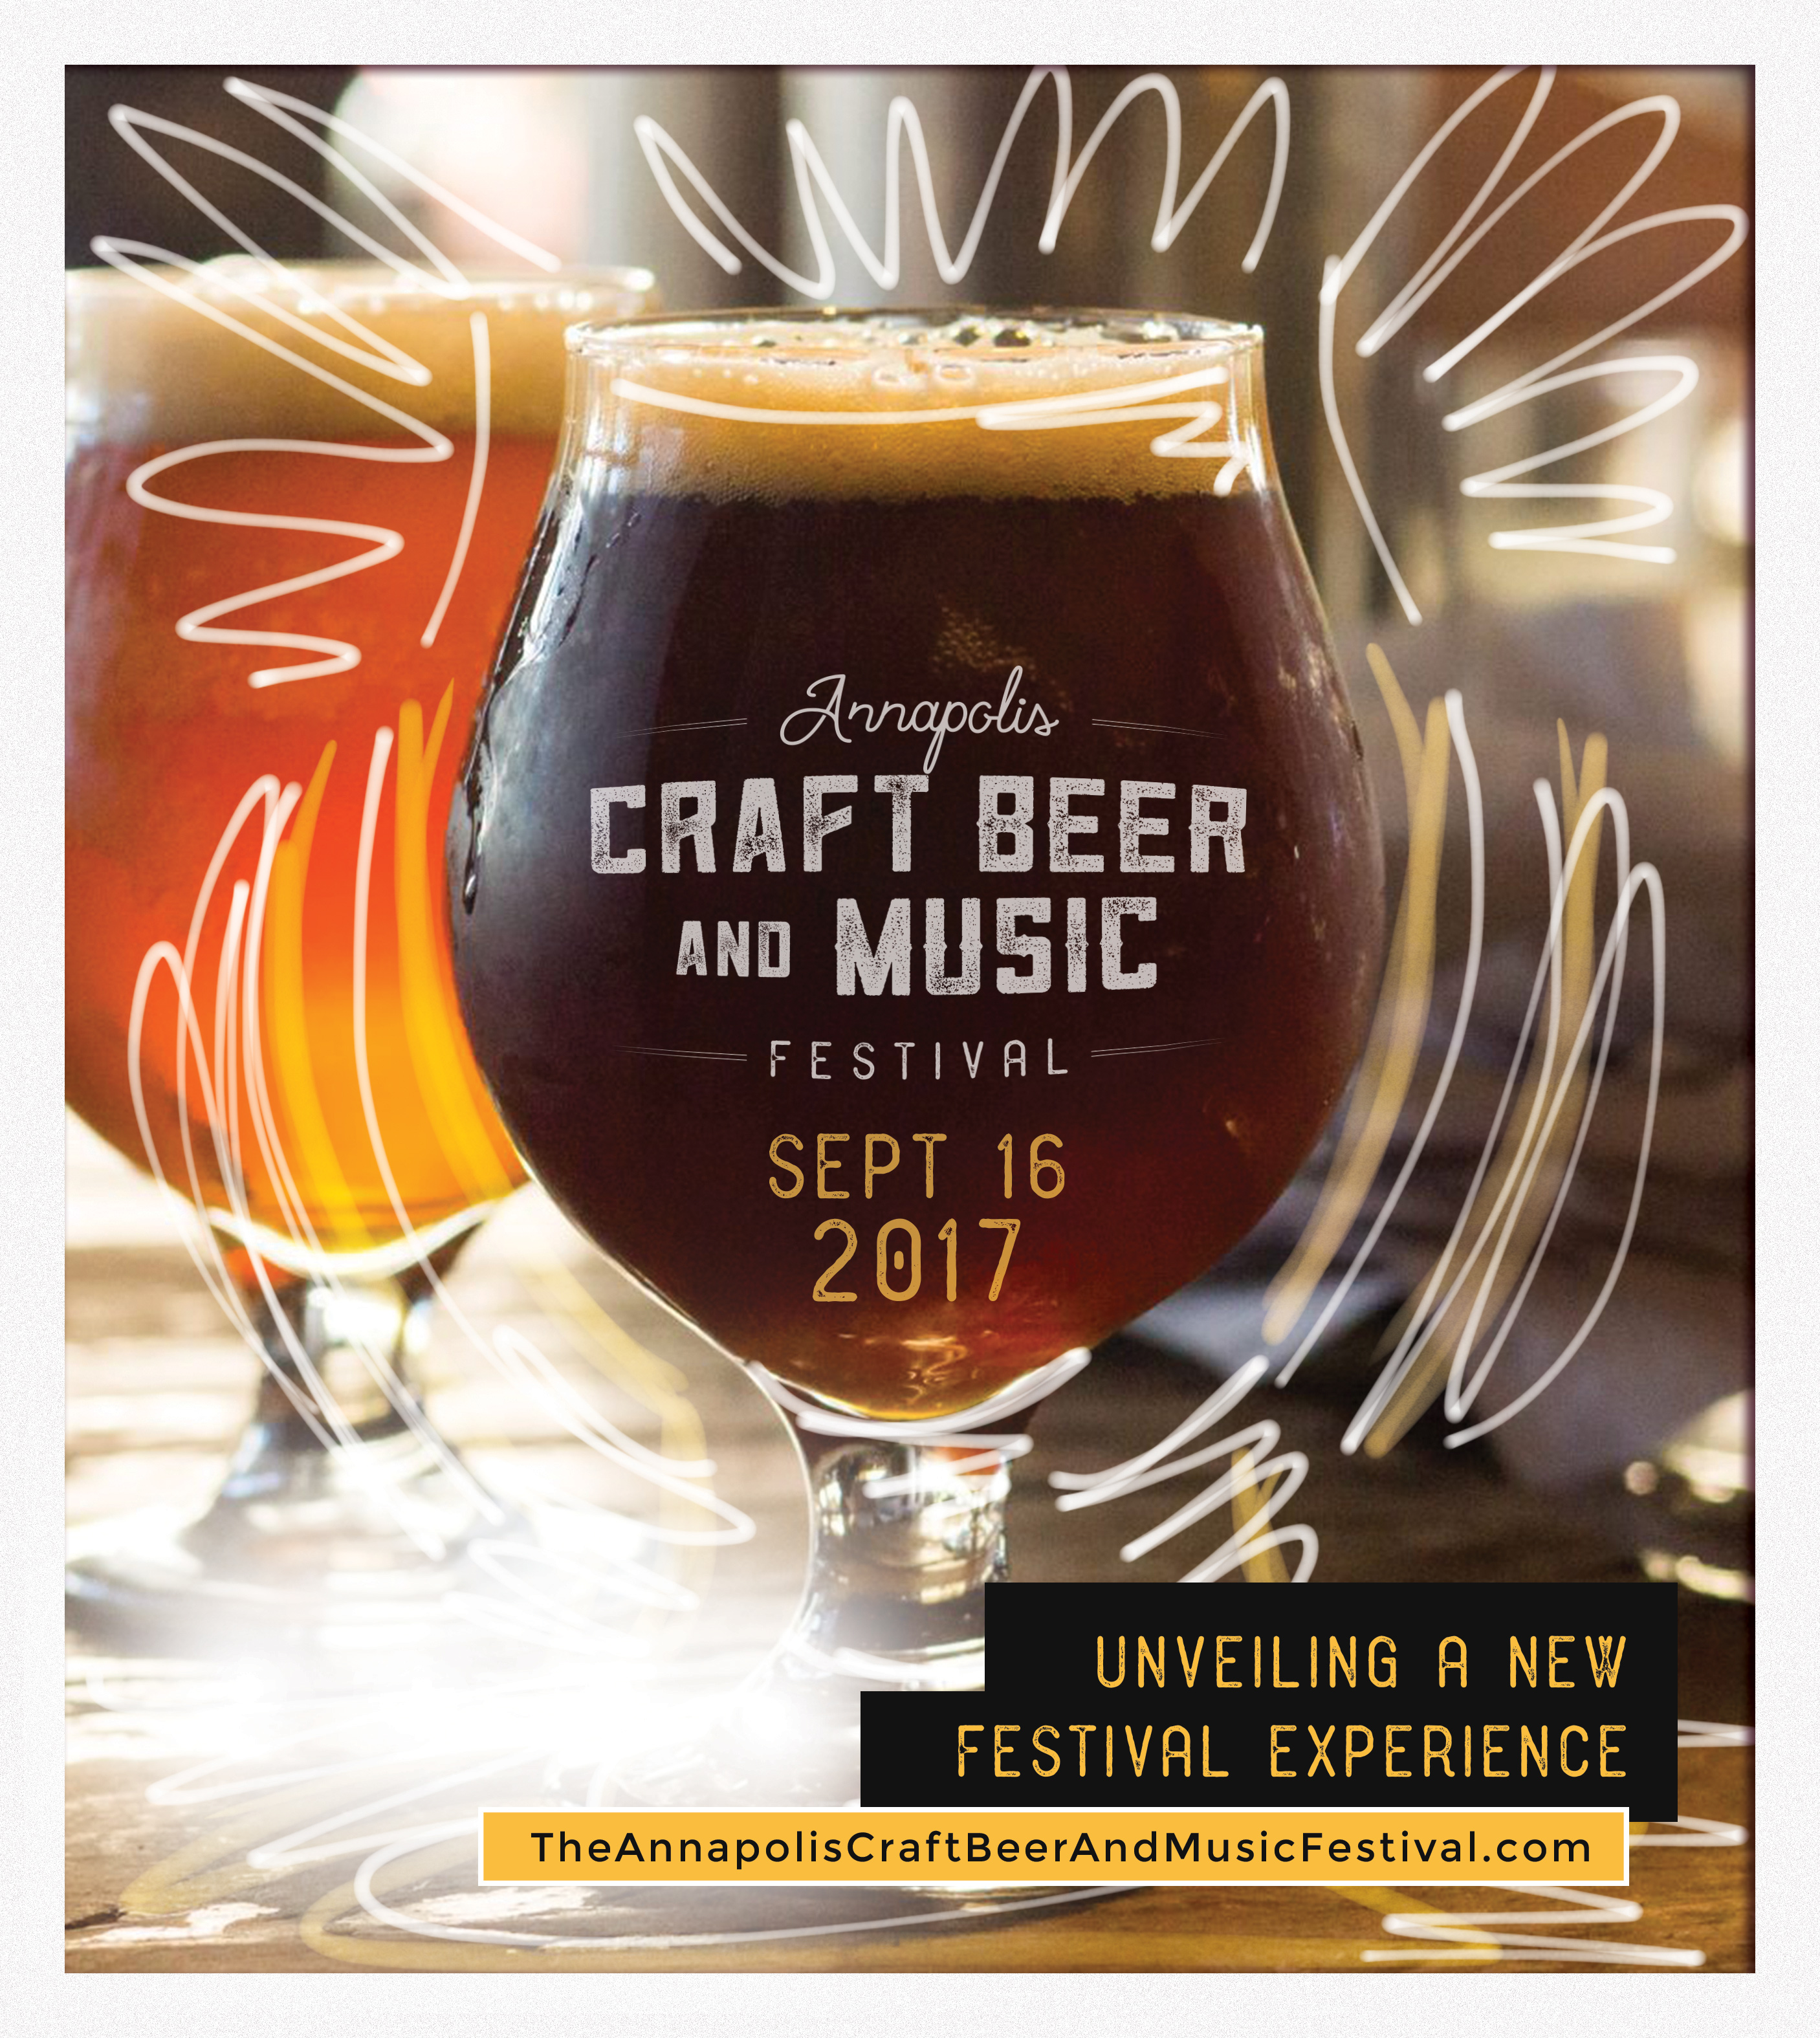 Partners summer 2017 upstart annapolis for Craft beer market share 2017